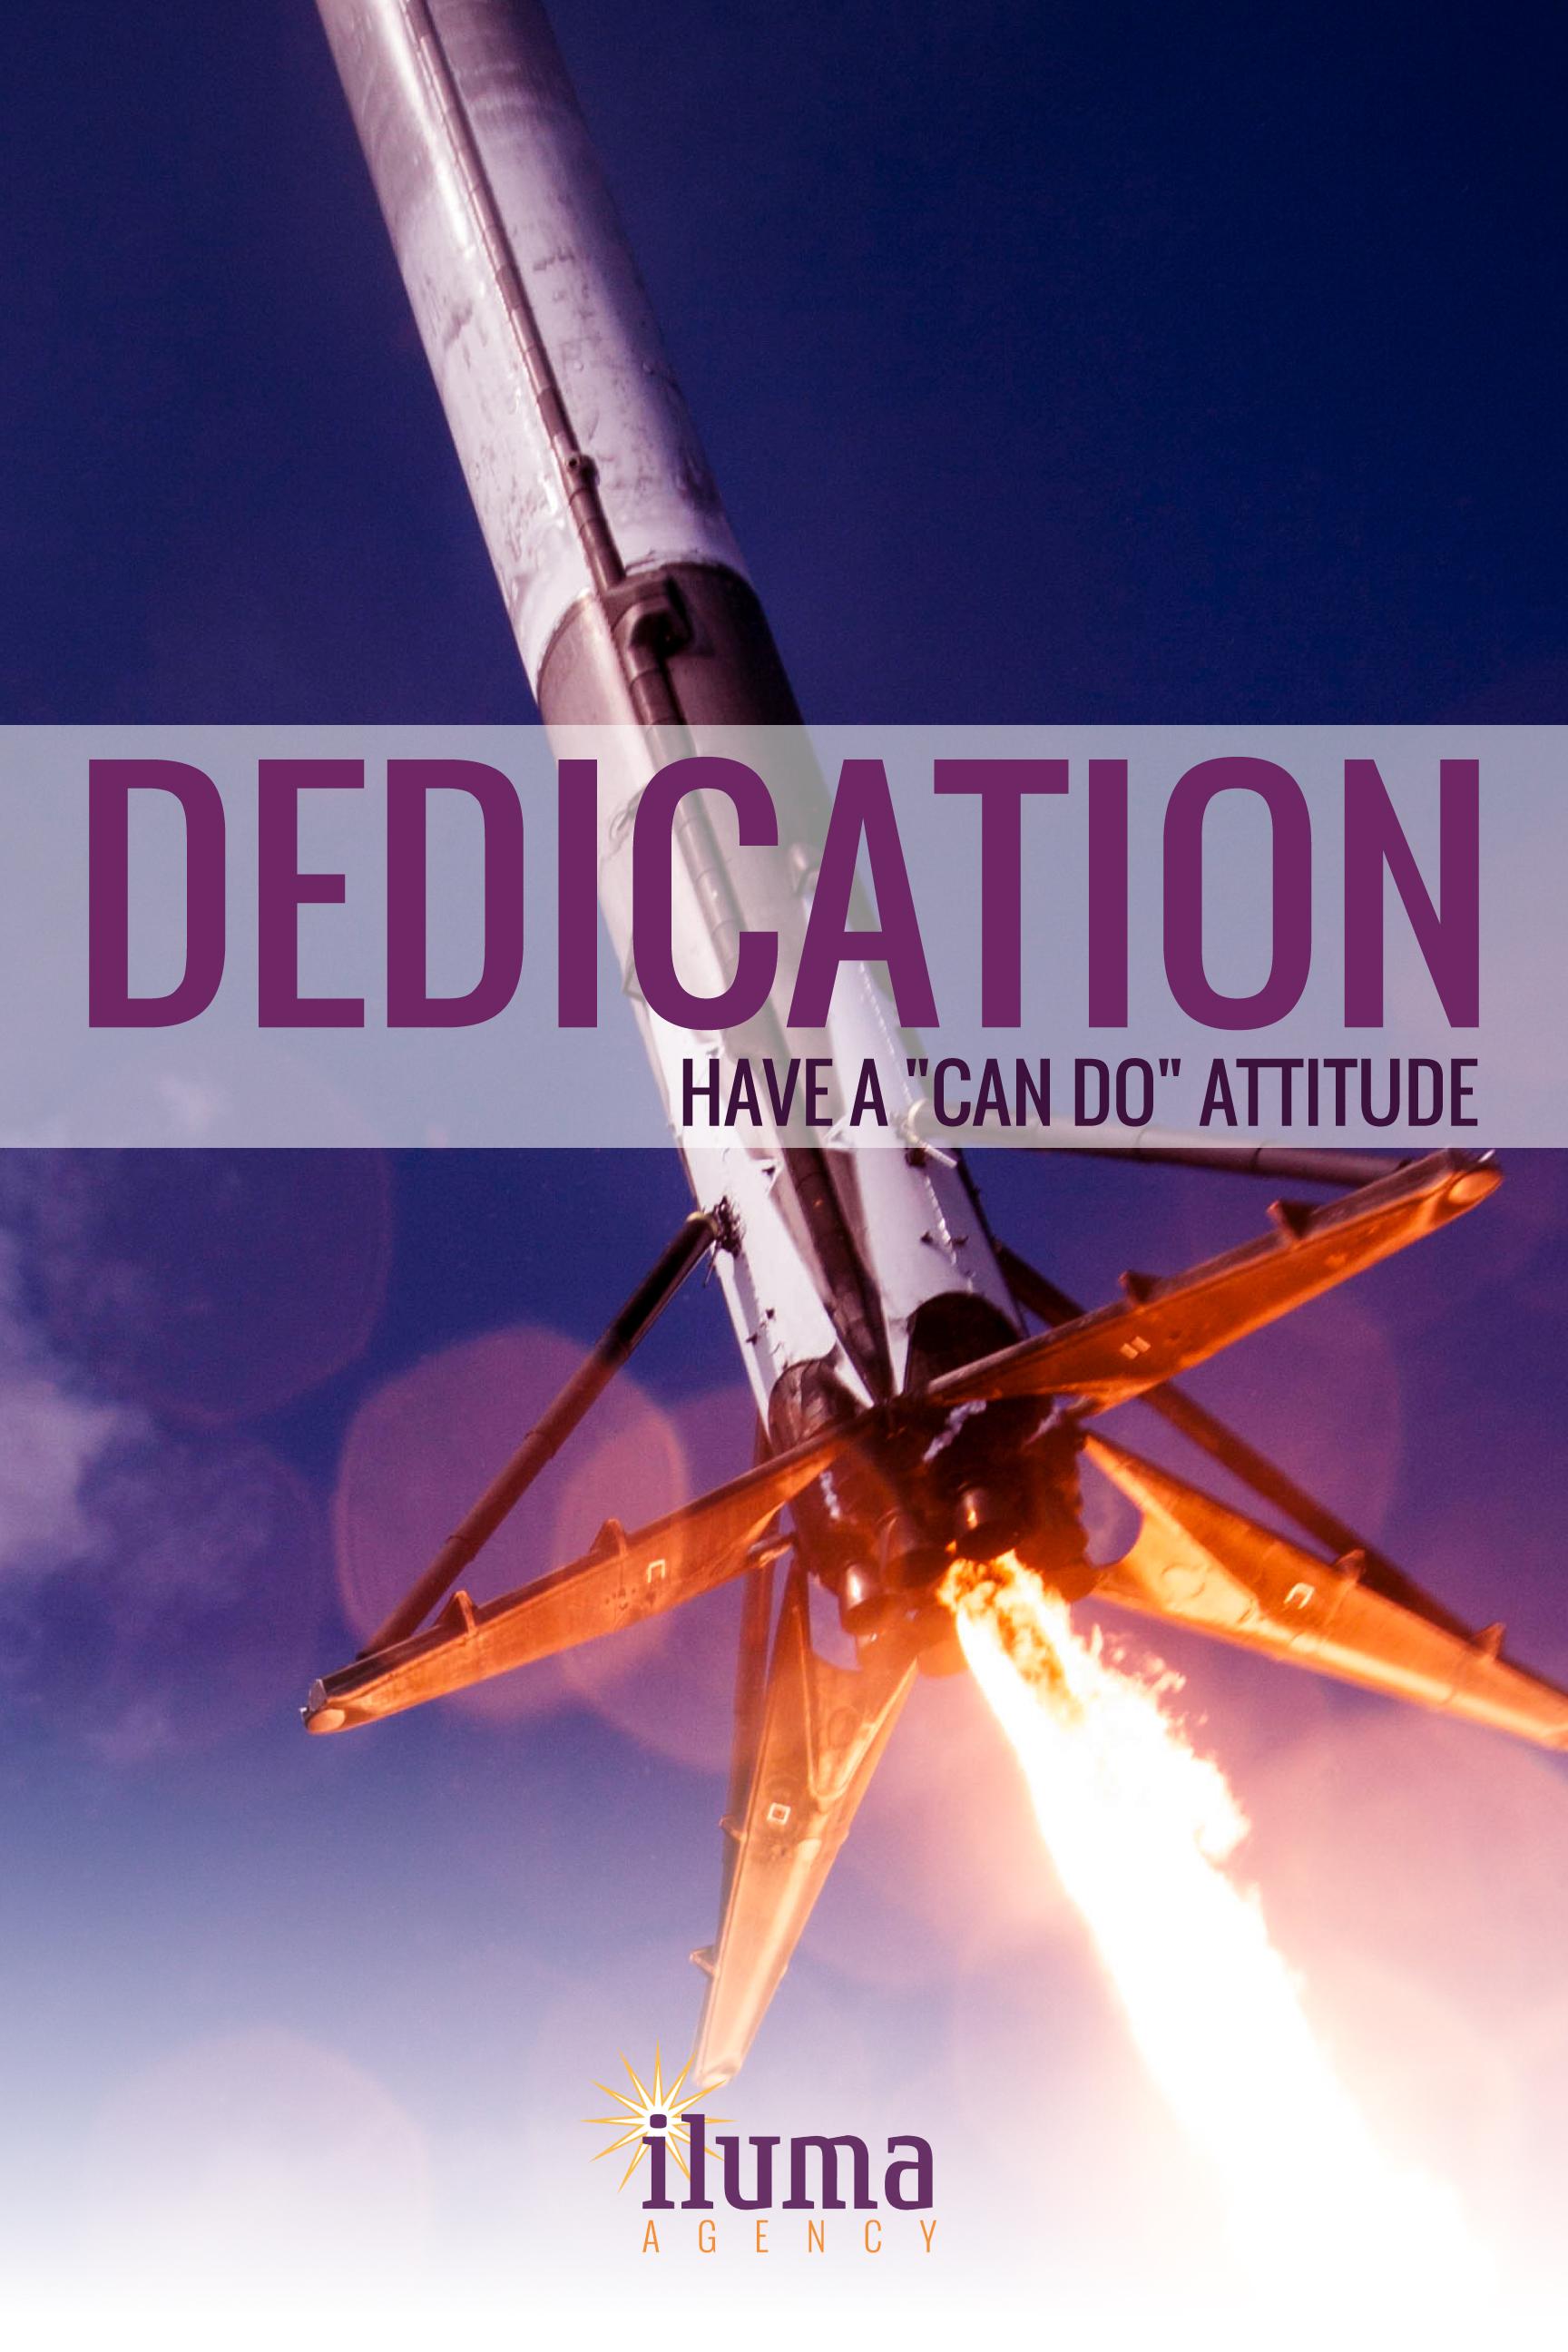 Dedication_24x36_Proof04.jpg